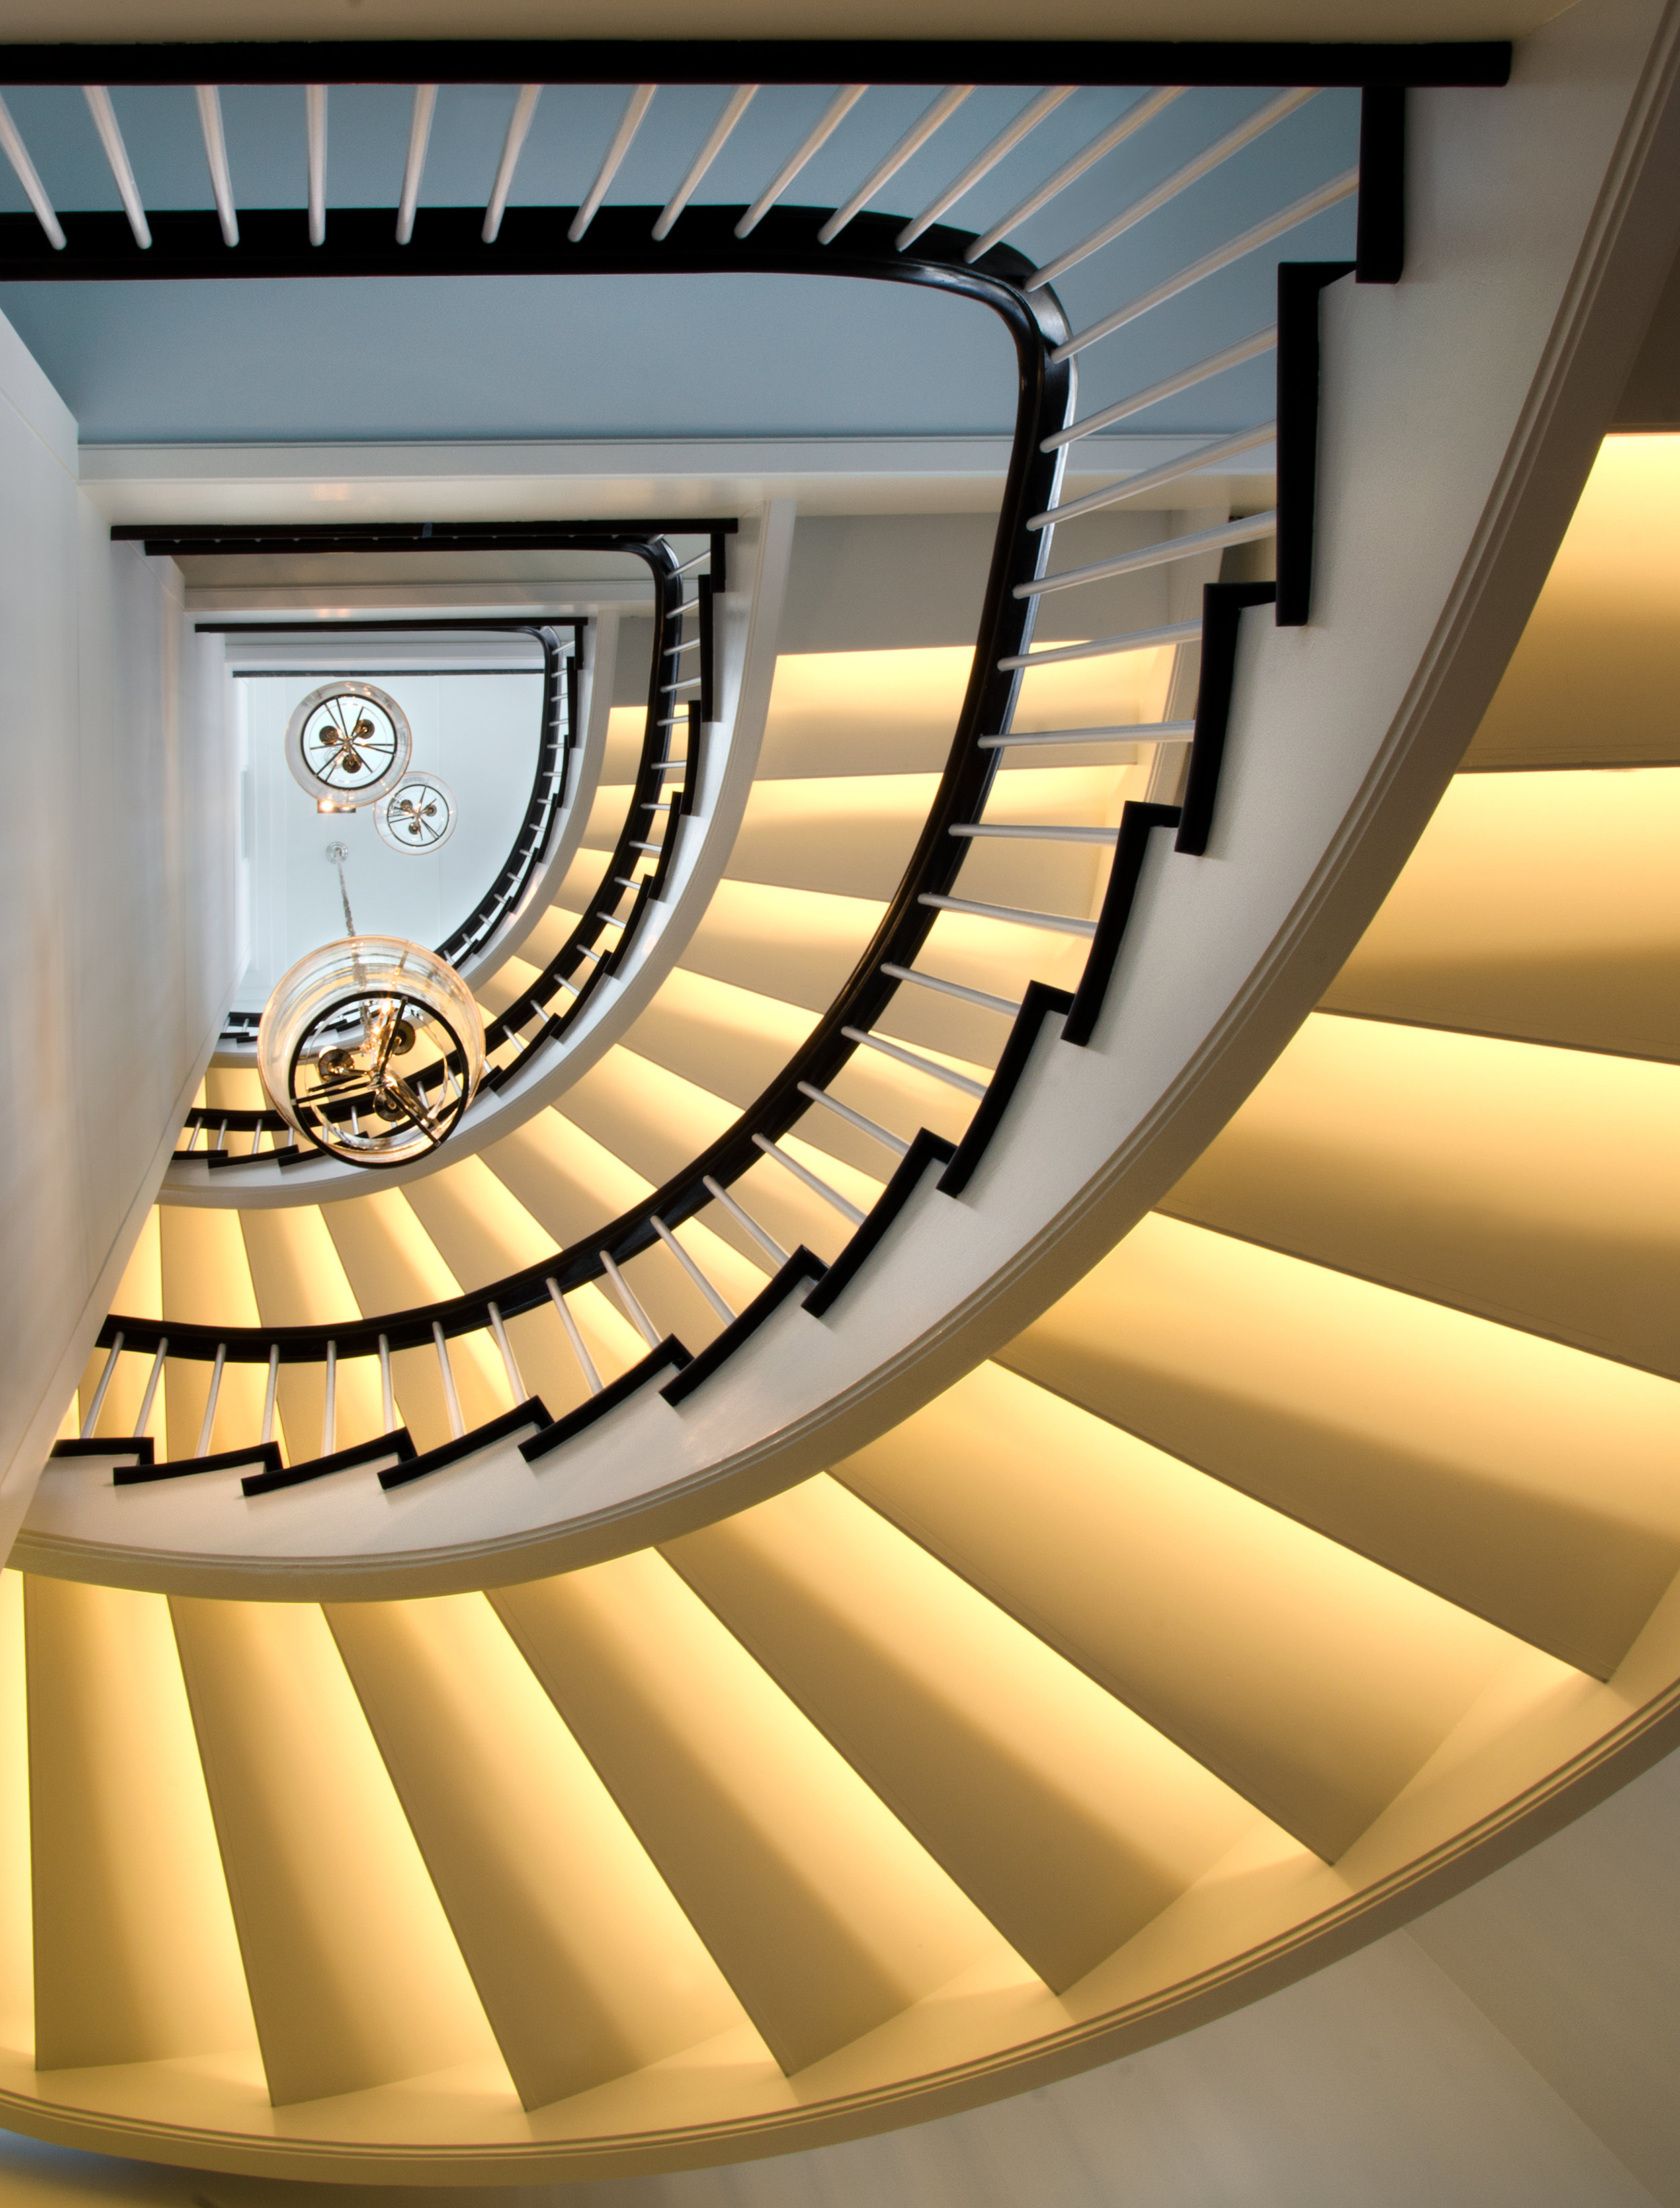 01 Bowe-Stewart-Stair.jpg